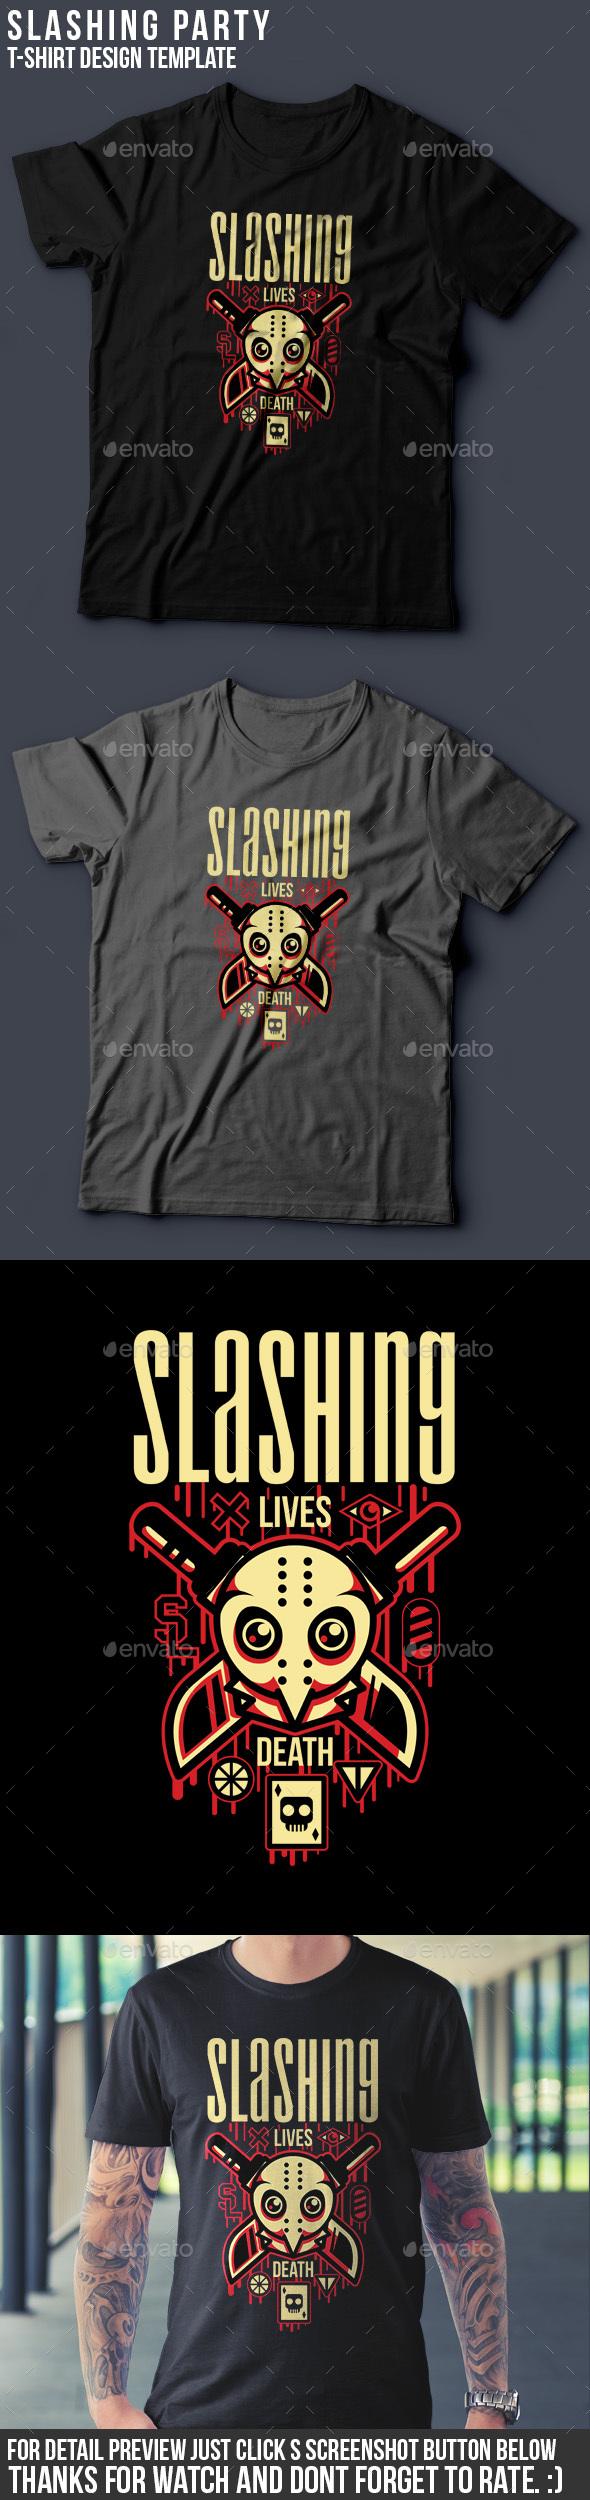 Slashing Party T-Shirt Design - Funny Designs